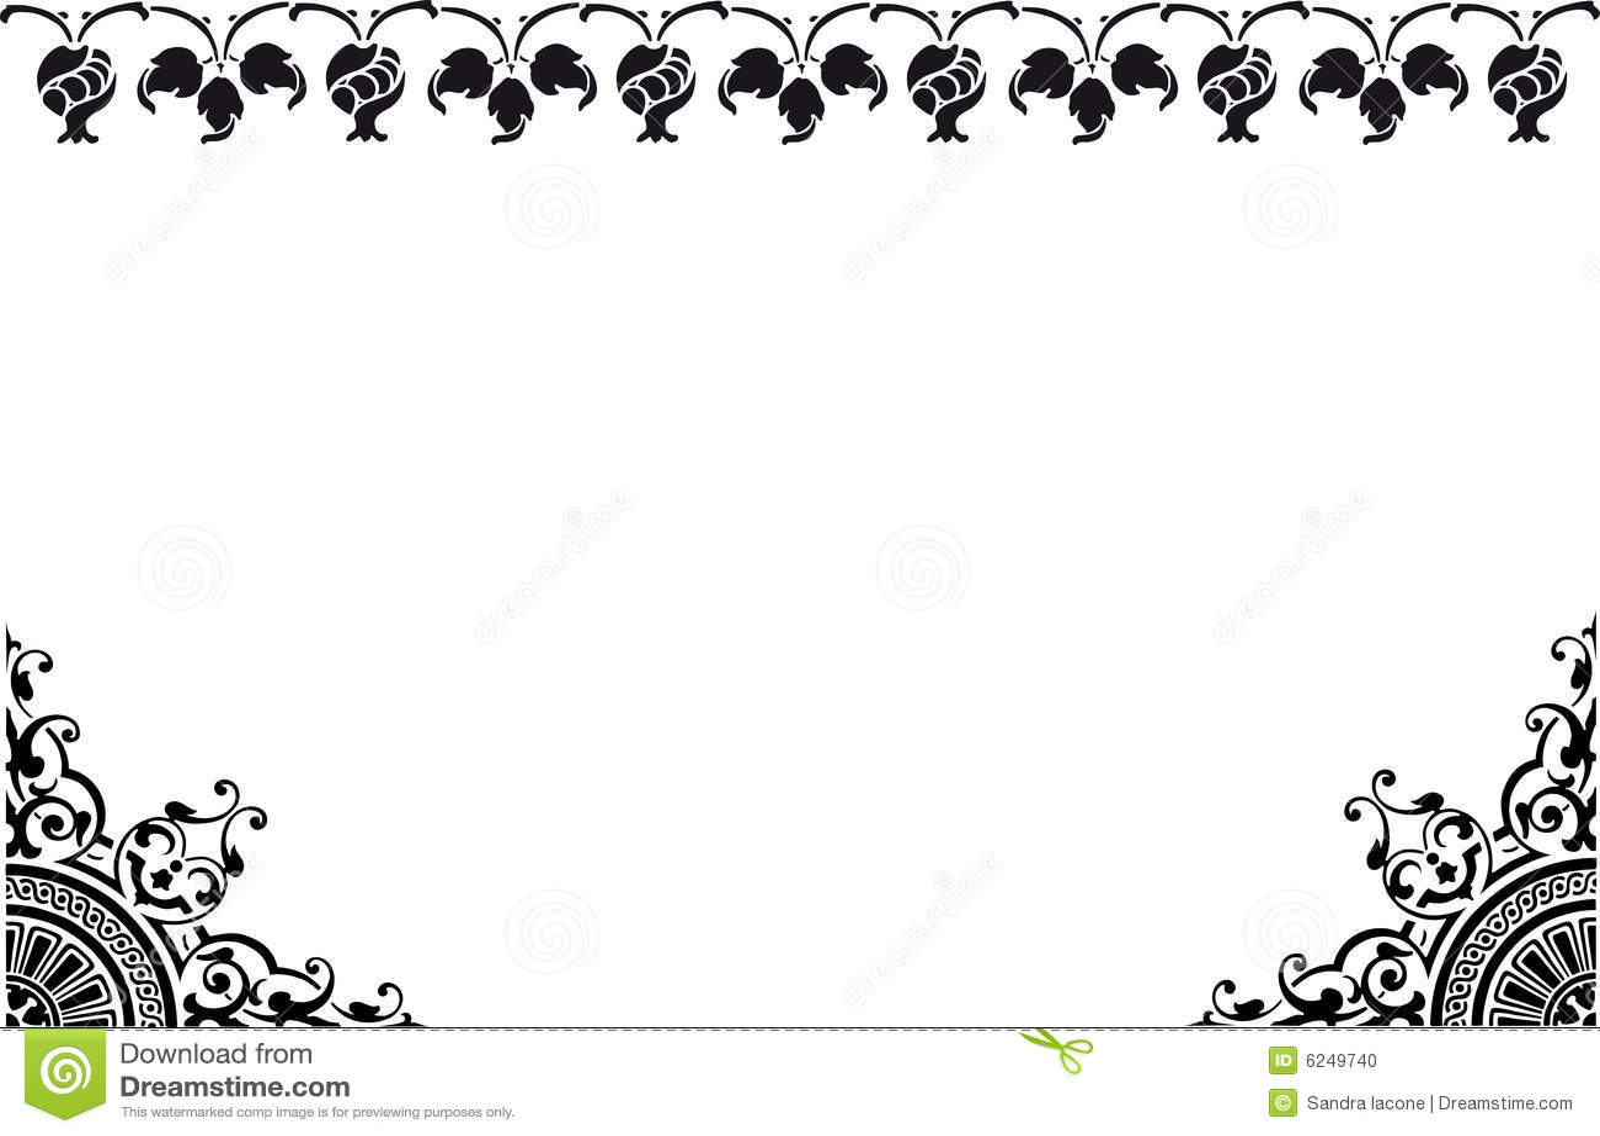 Frame black and white stock illustration. Image of ...